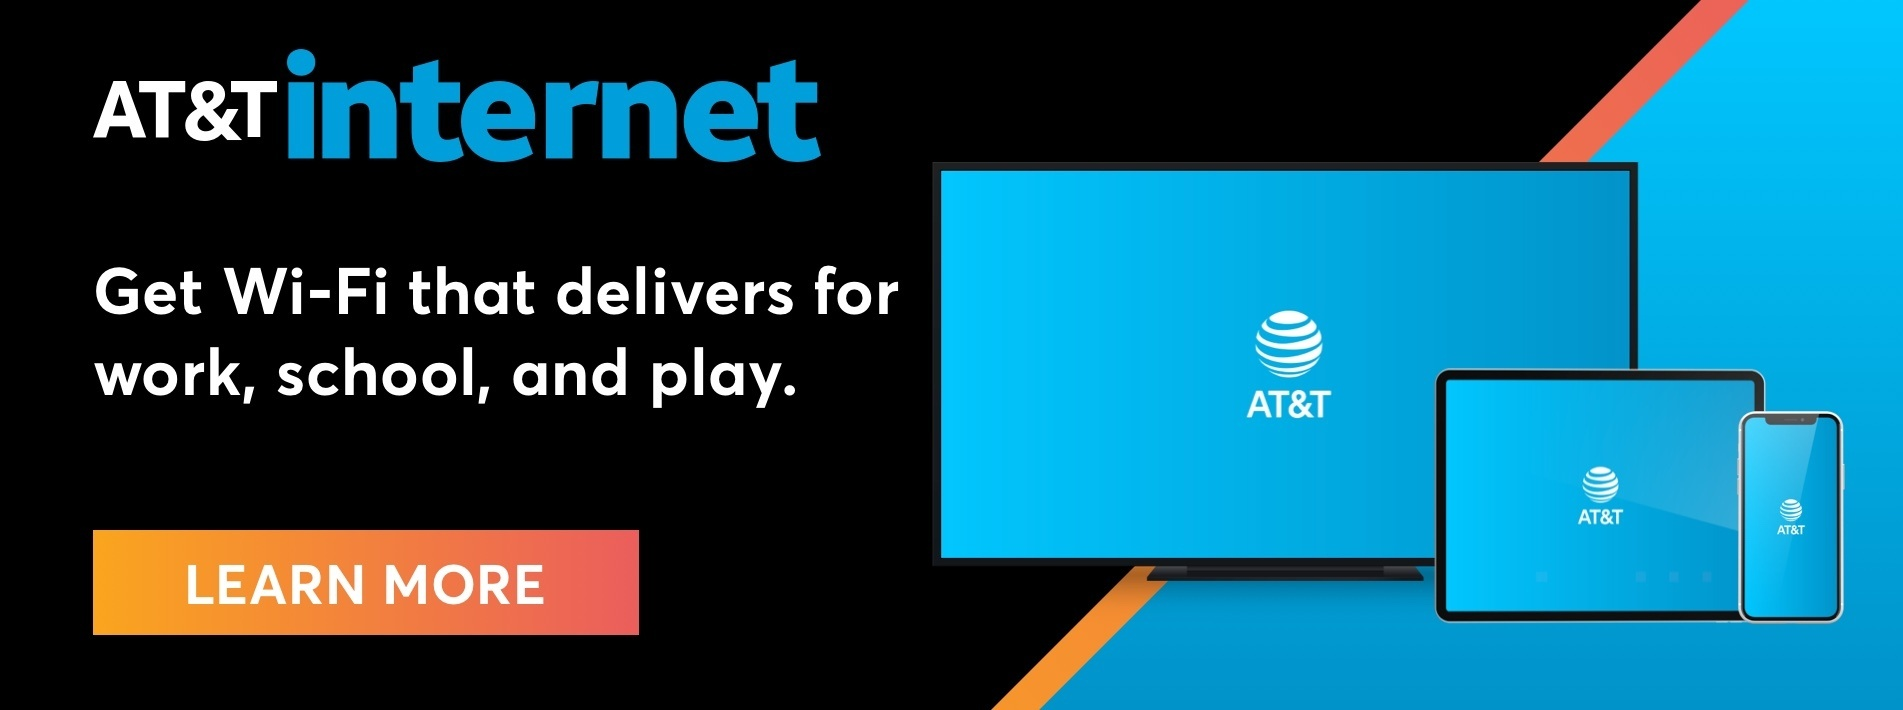 AT&T Landing Page